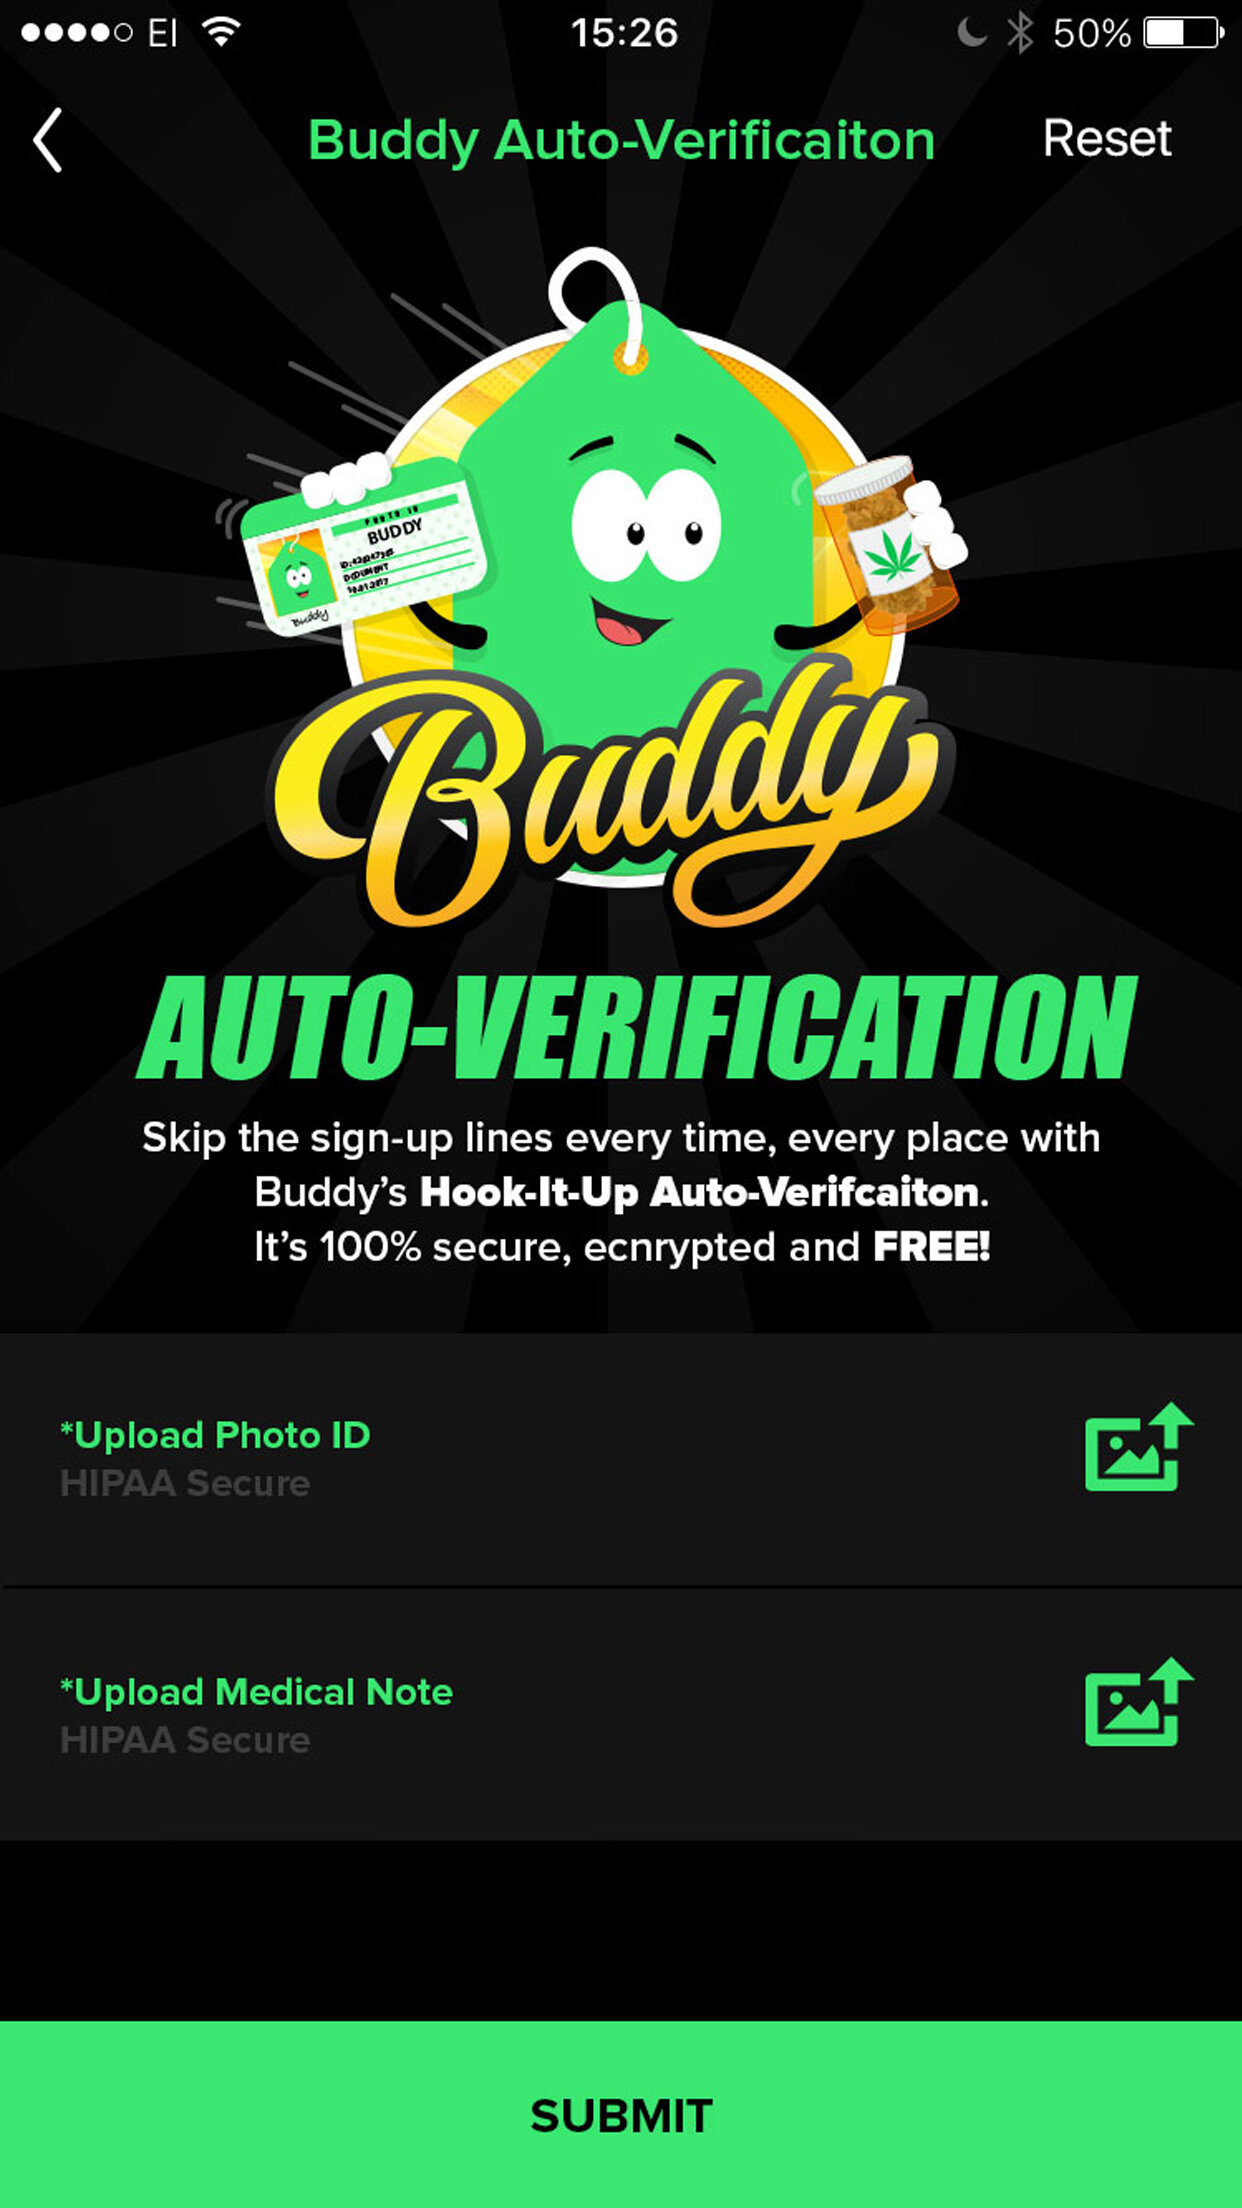 02_Buddy_Auto_Verification.jpg